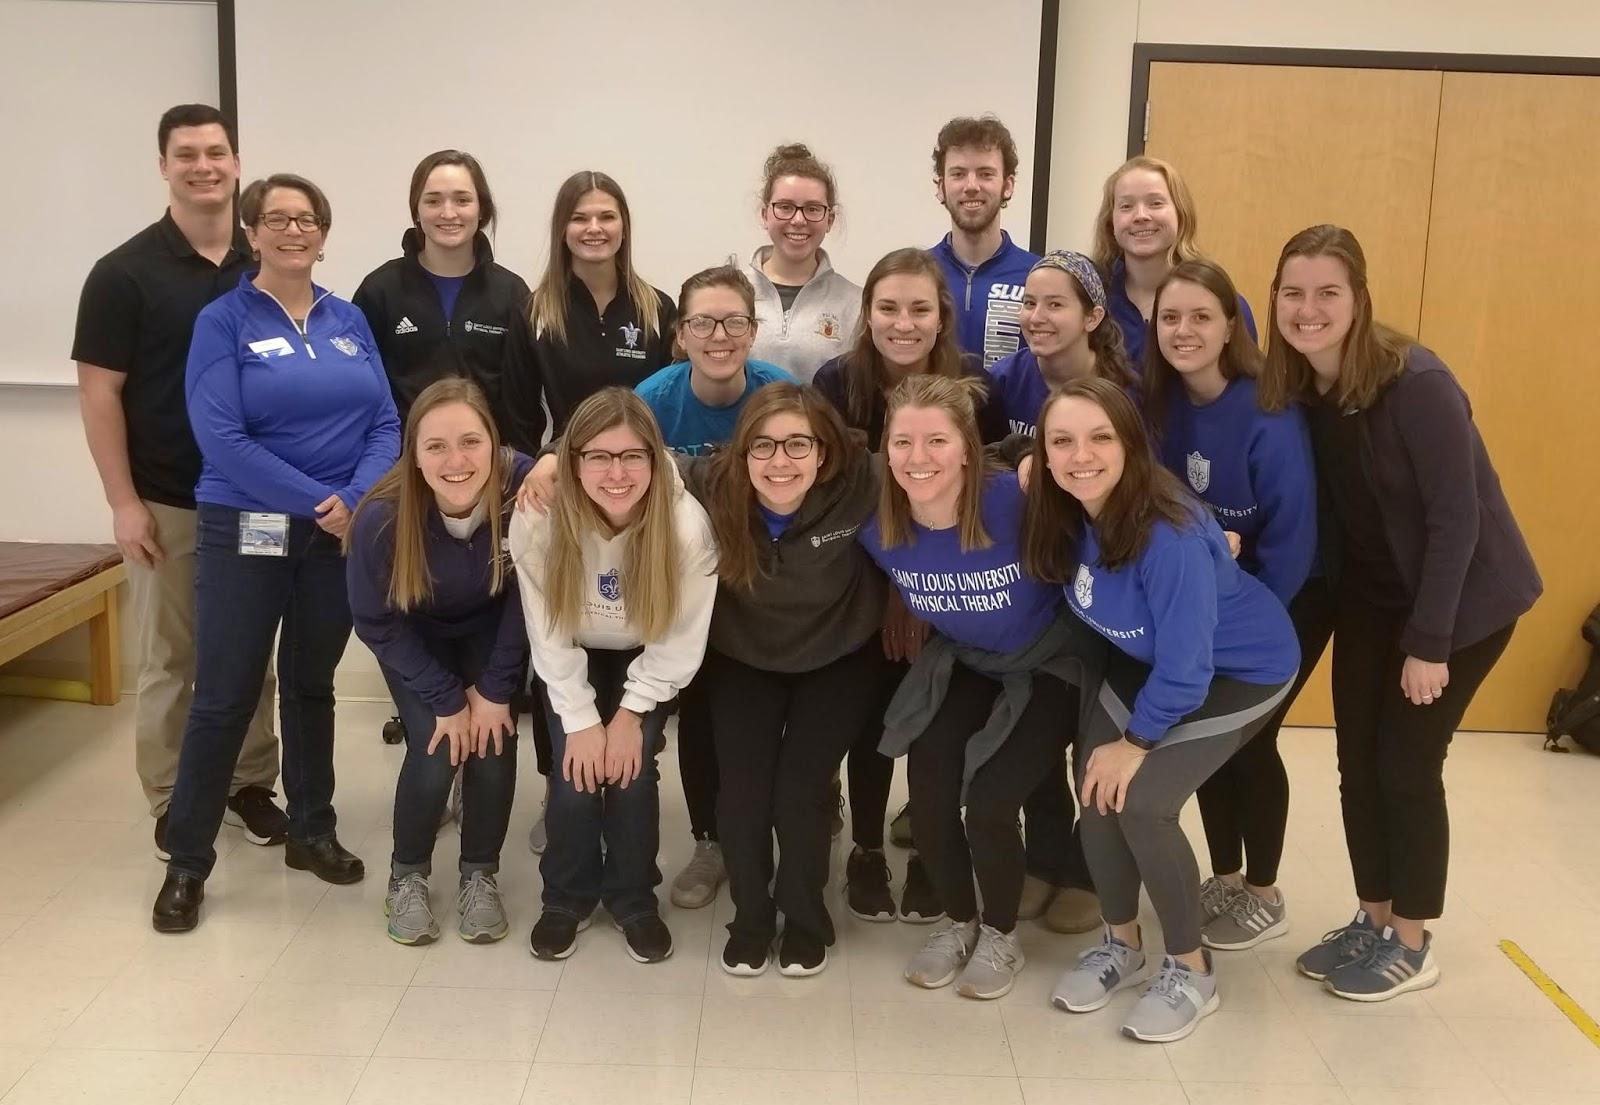 Saint Louis University Athletic Training Program: SLU AT and